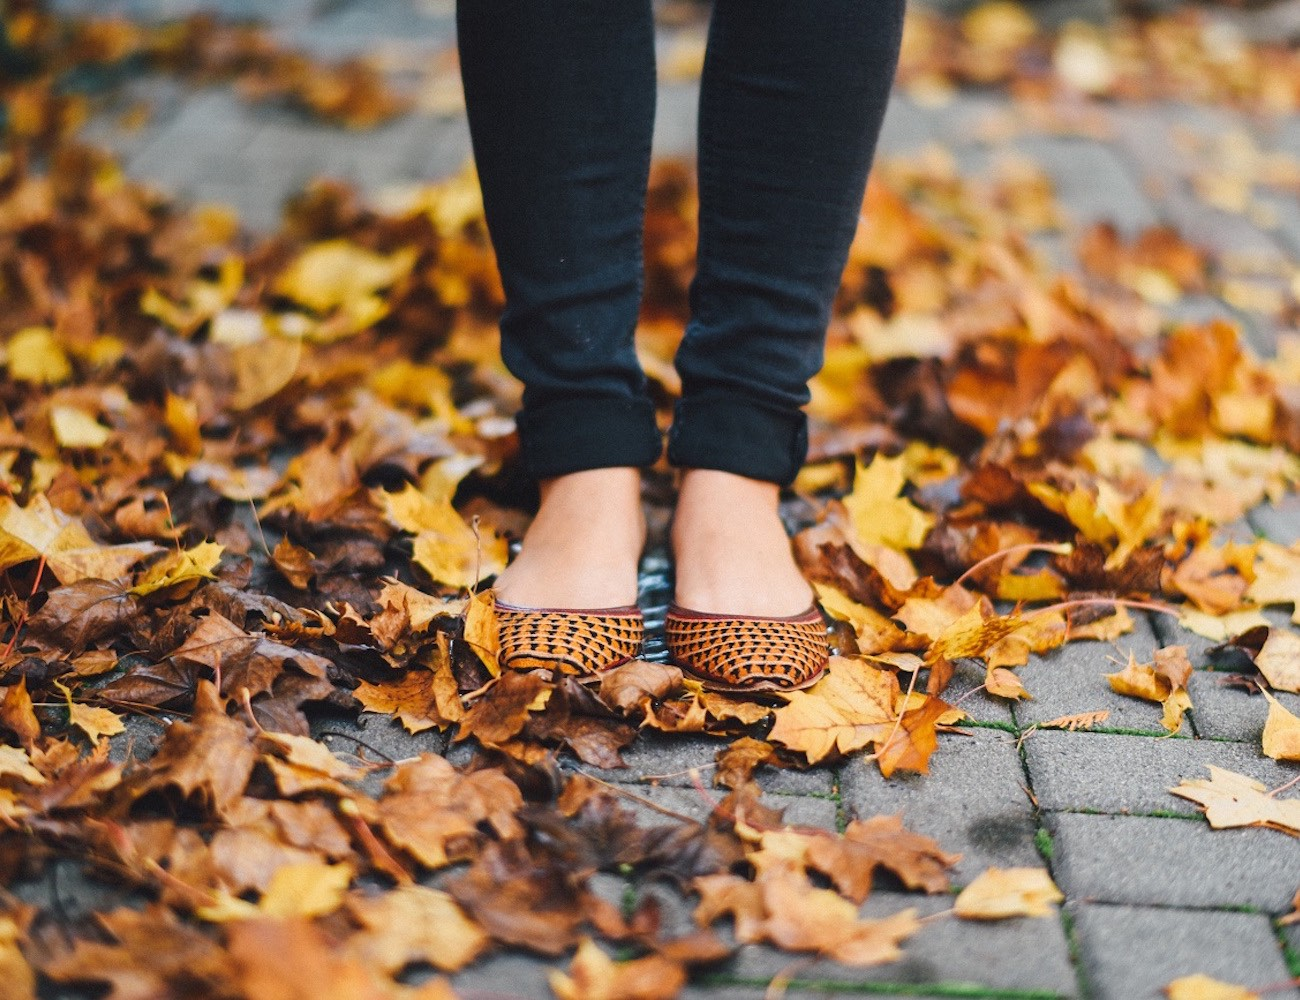 Fuchsia+Handmade+Shoes